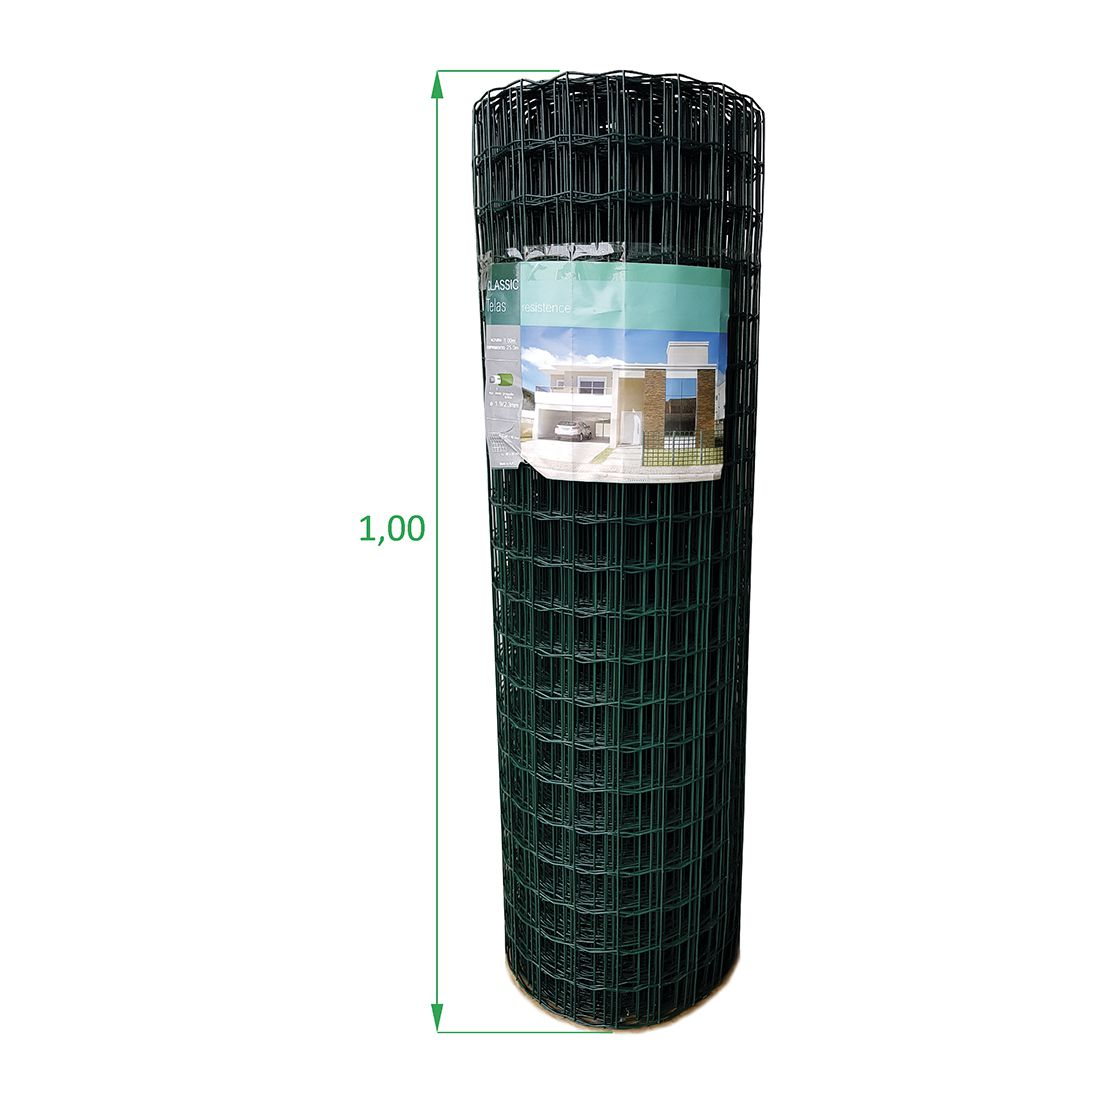 Tela Soldada e Revestida em PVC - 1,00 X 25 m 5x5